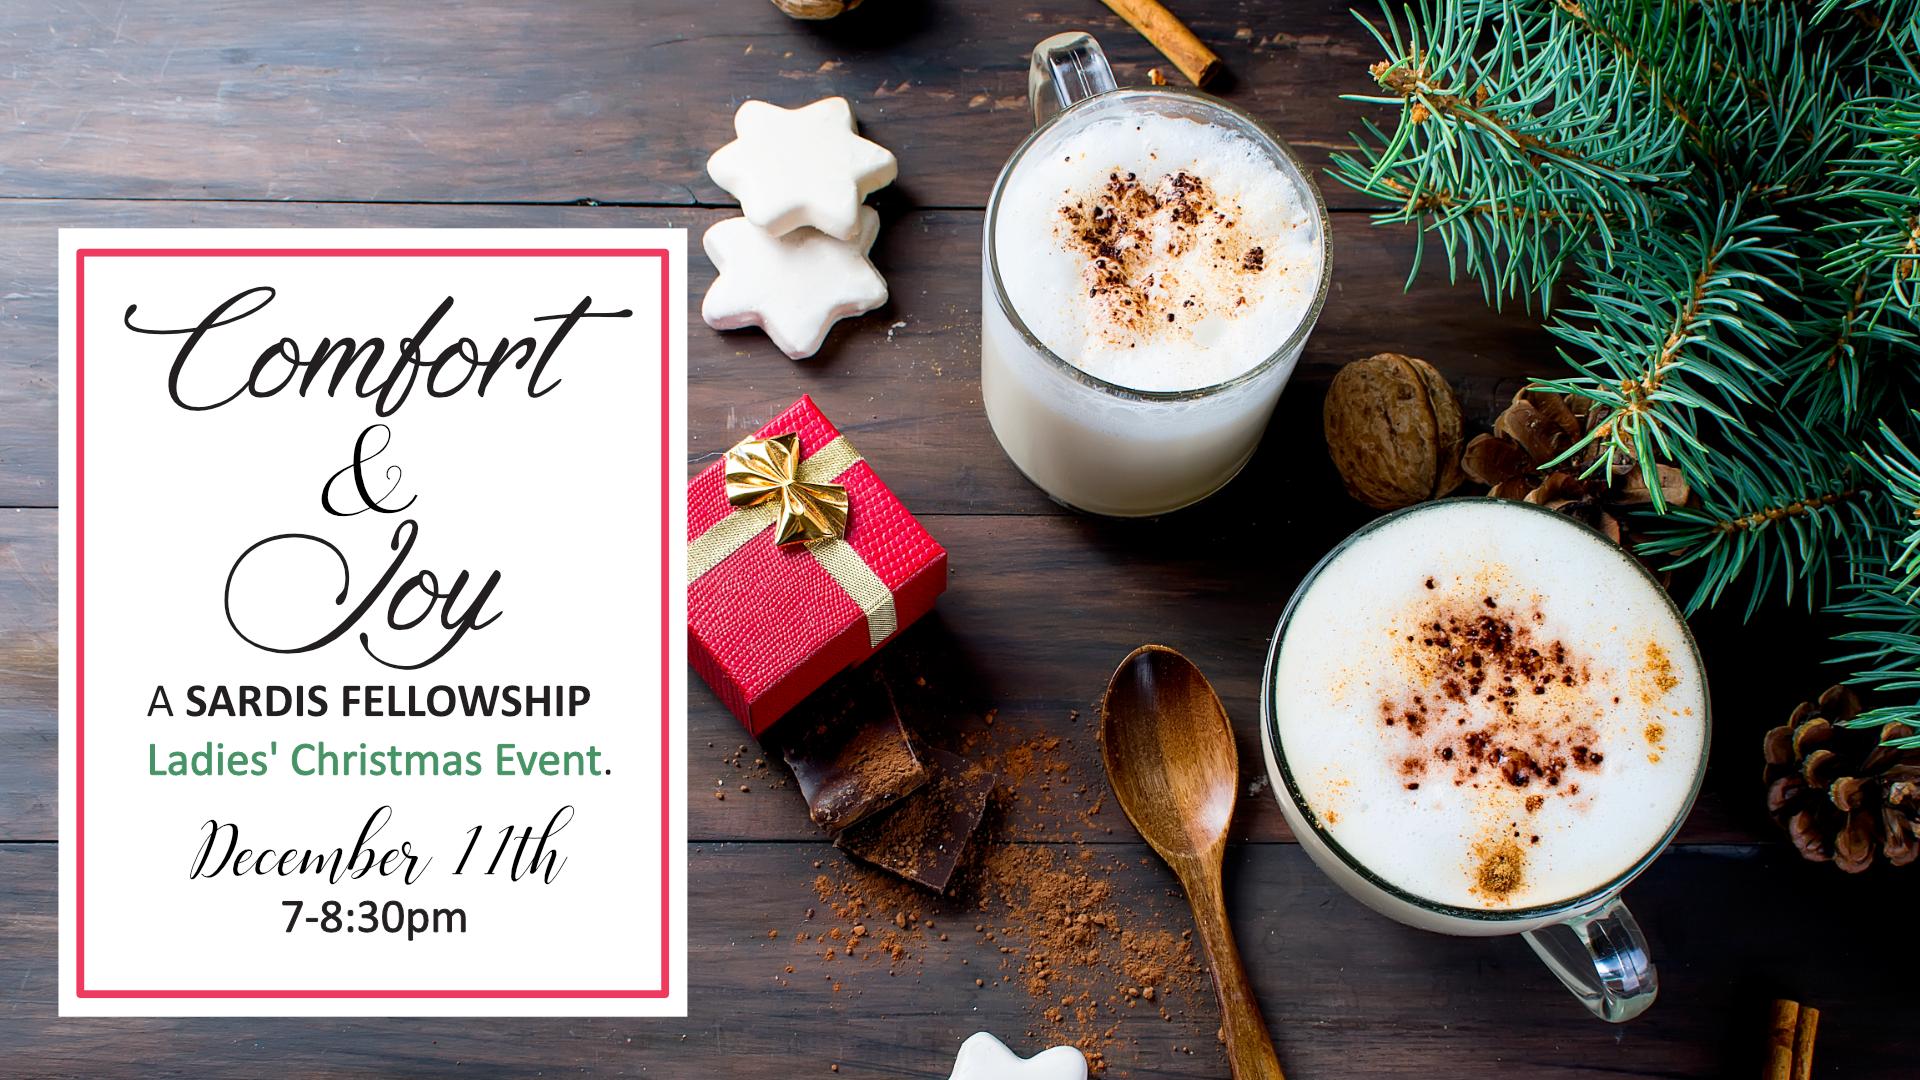 Comfort & Joy Ladies' Christmas Event 2017 PowerPoint.png